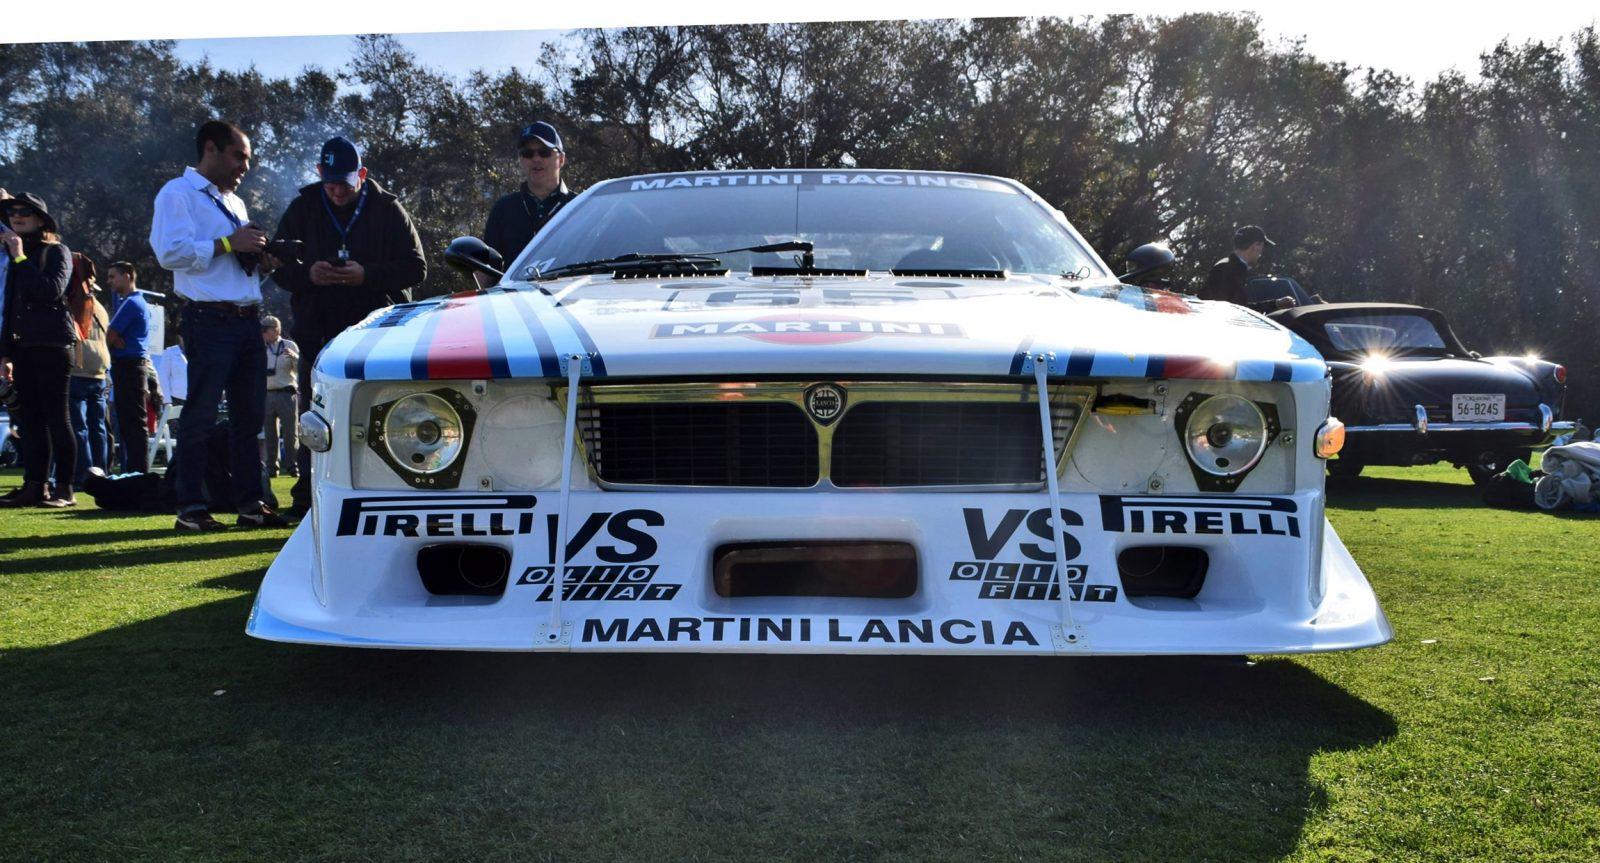 1981 Lancia BETA Monte Carlo Turbo 7